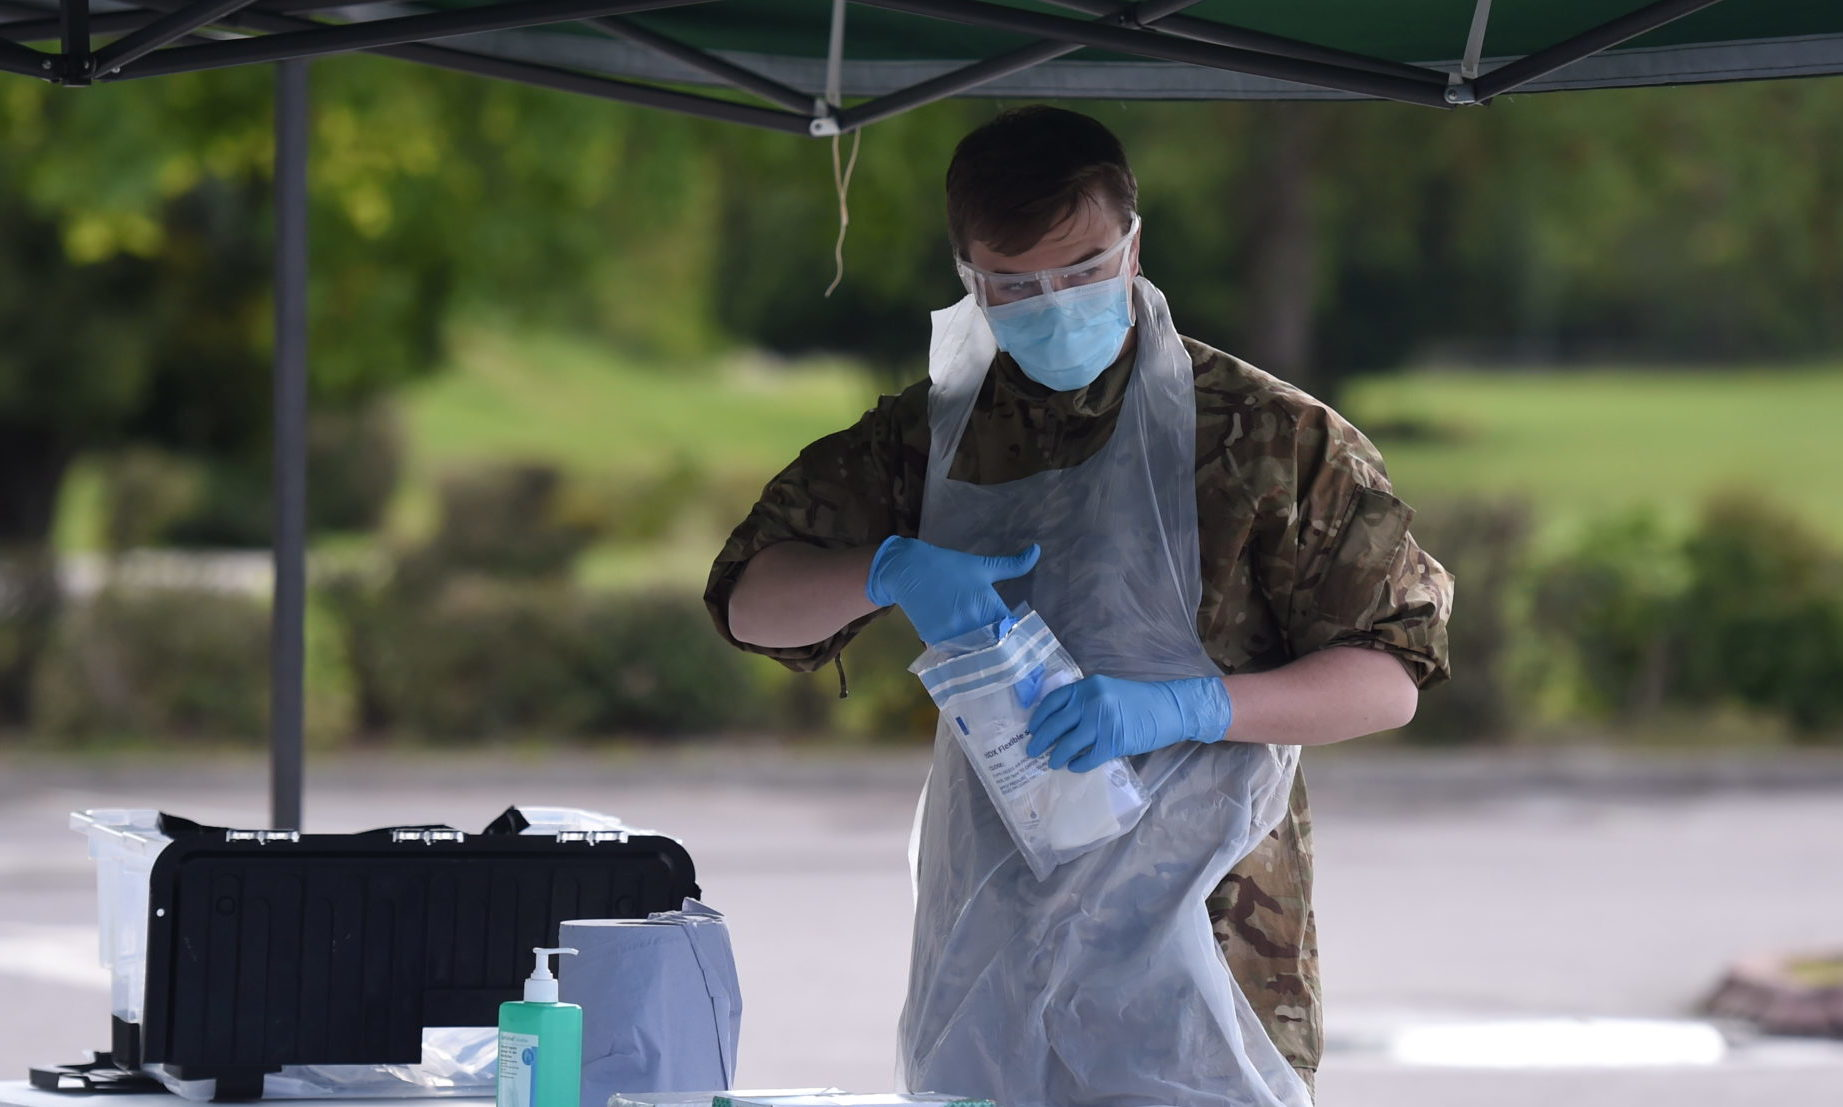 Coronavirus testing at Banchory, Aberdeenshire.